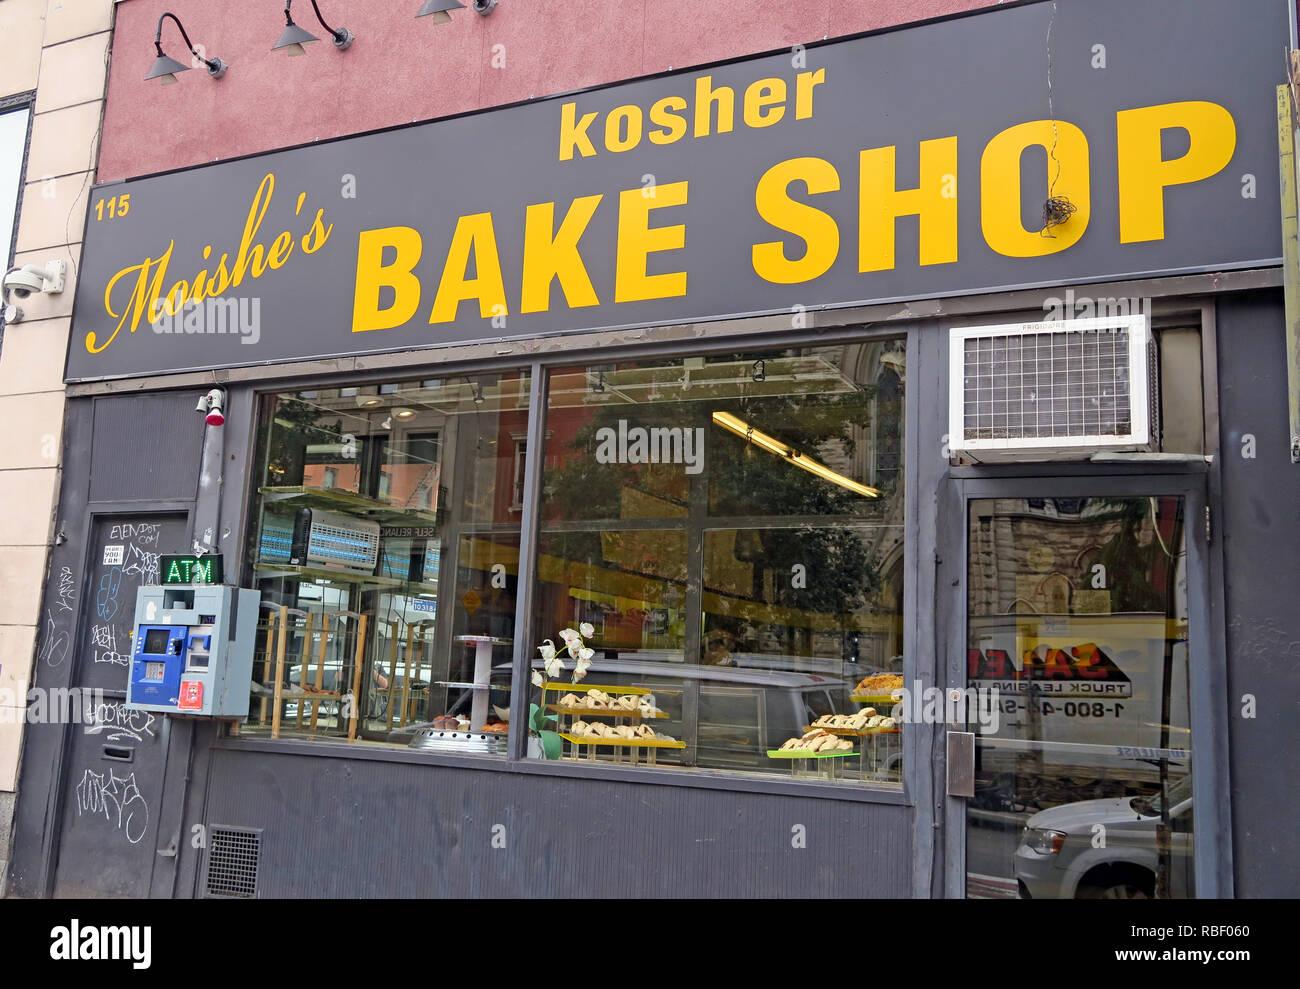 GoTonySmith,@HotpixUK,HotpixUK,NOHO NYC,NYC,New York City,St Marks Place,St Marks Place NYC,street,New York Street,USA,America,City Centre,city,centre,center,city center,East Village,Eastvillage,New York Travel Tourism,store,stores,in New York,Jew,bakers,baking,Kosher Baking,Moishes Kosher Bake Shop 115 2nd Ave,Manhattan,New York,shop,retail,Moishes,2nd Ave,Manhattan New York,Best Jewish Bakery,babka,flaky rugelach,doughy challah